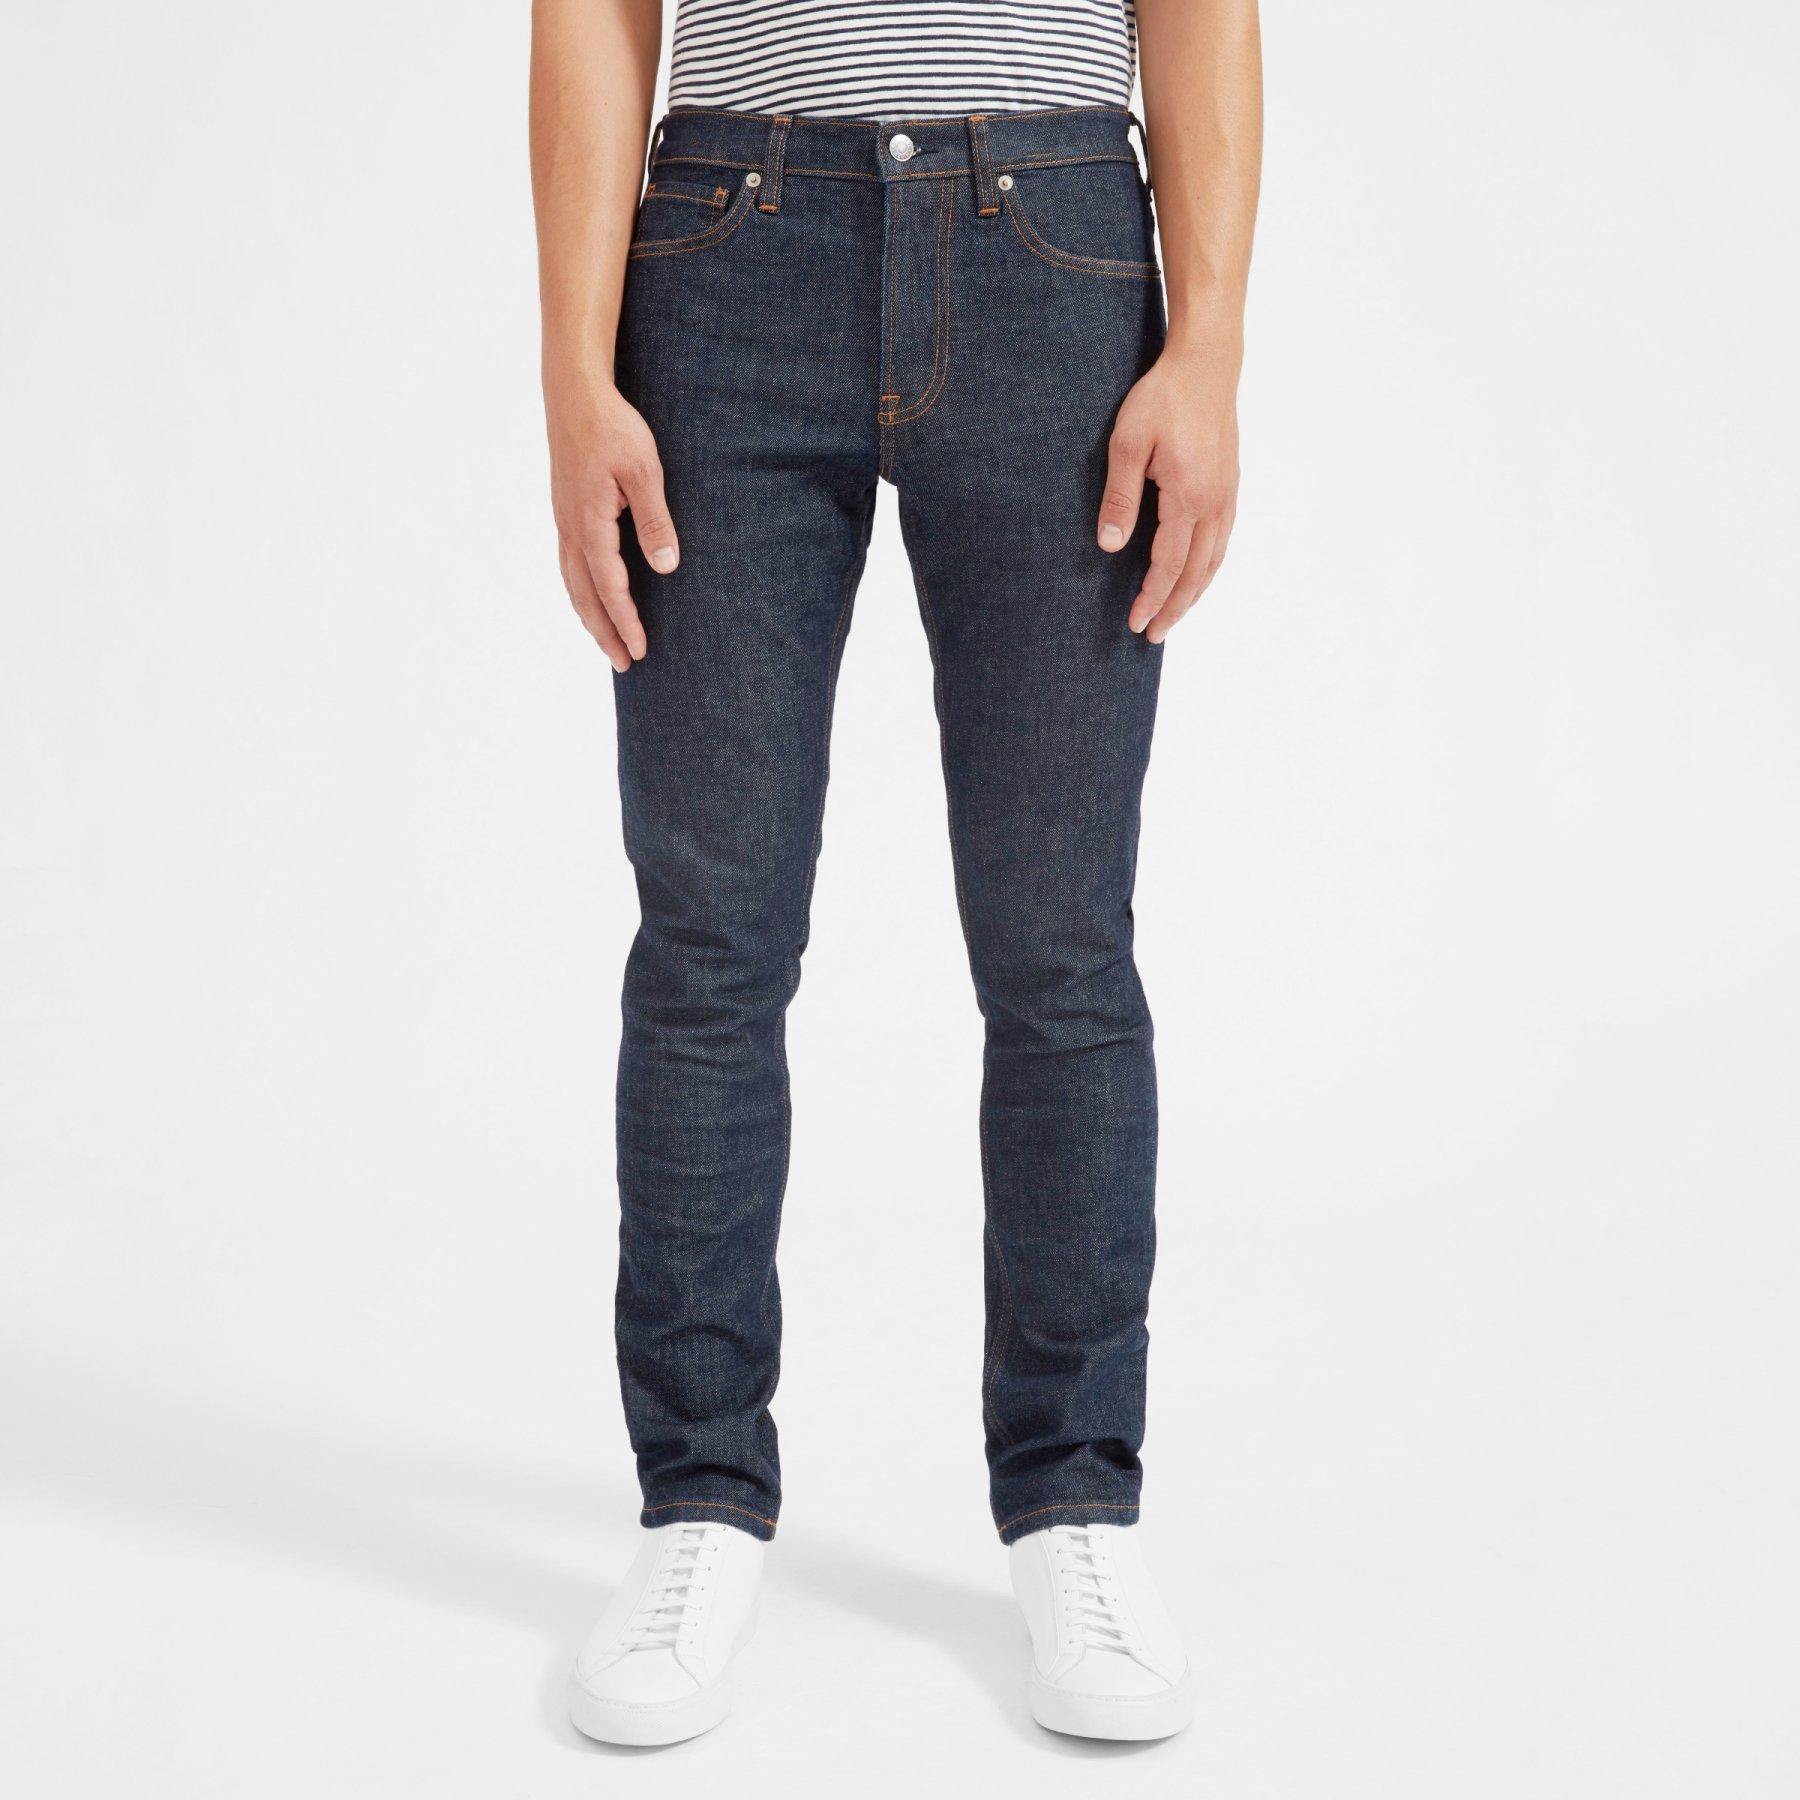 everlane review 6 best staples mens slim fit jean